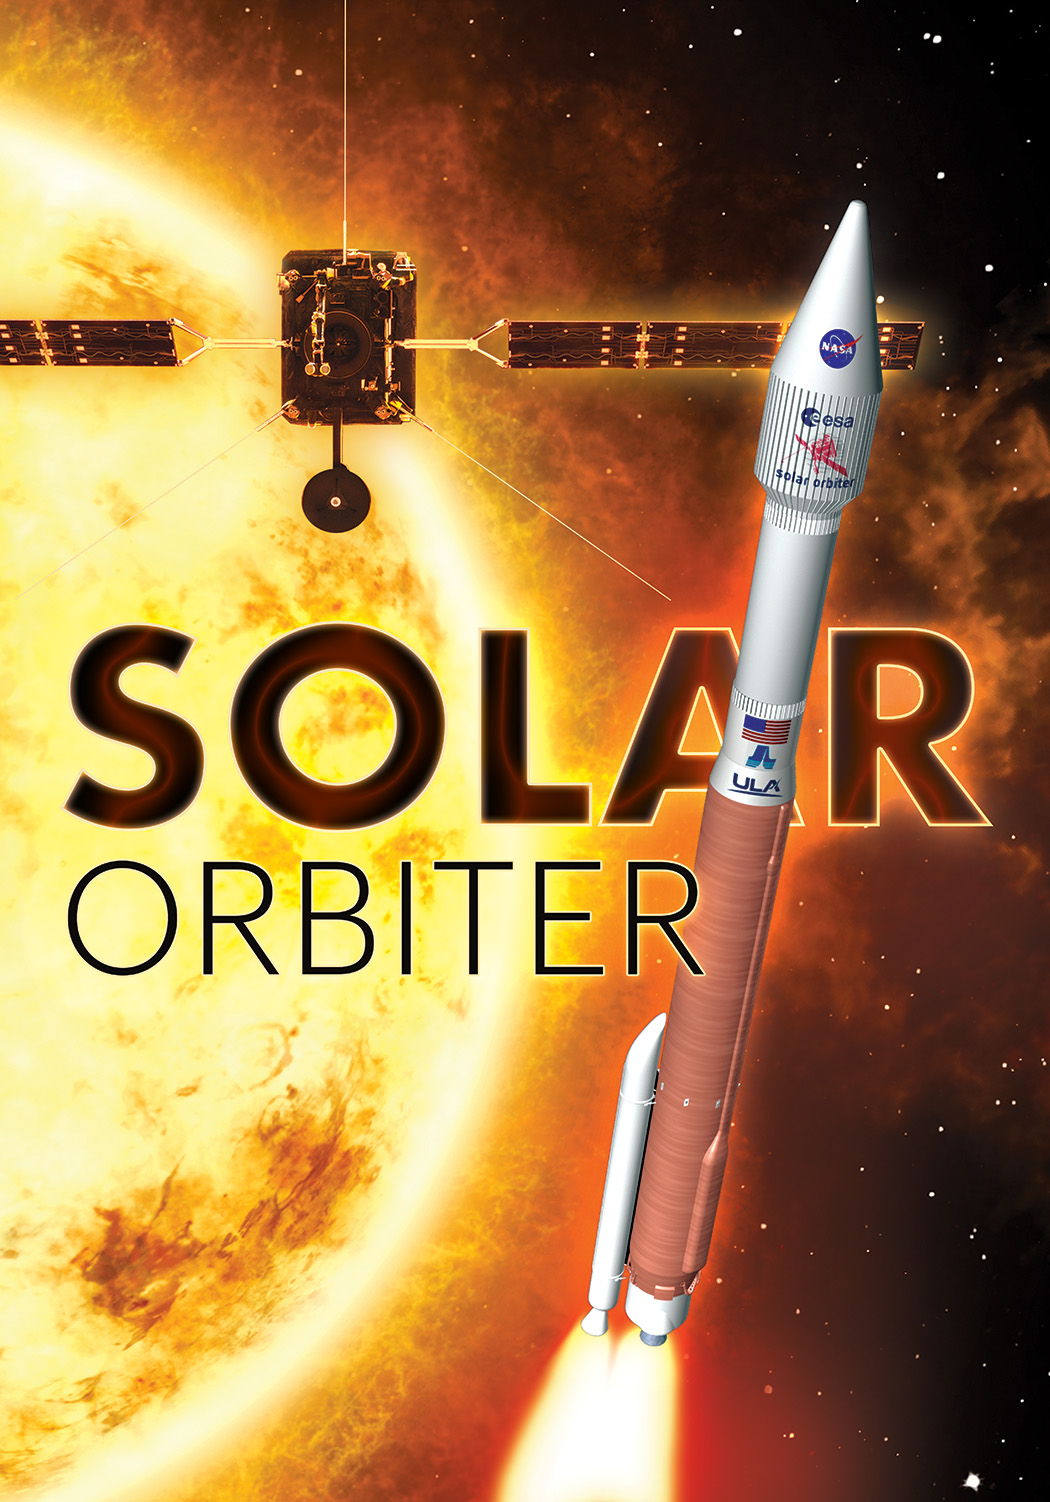 solarorbiter_external_sticker